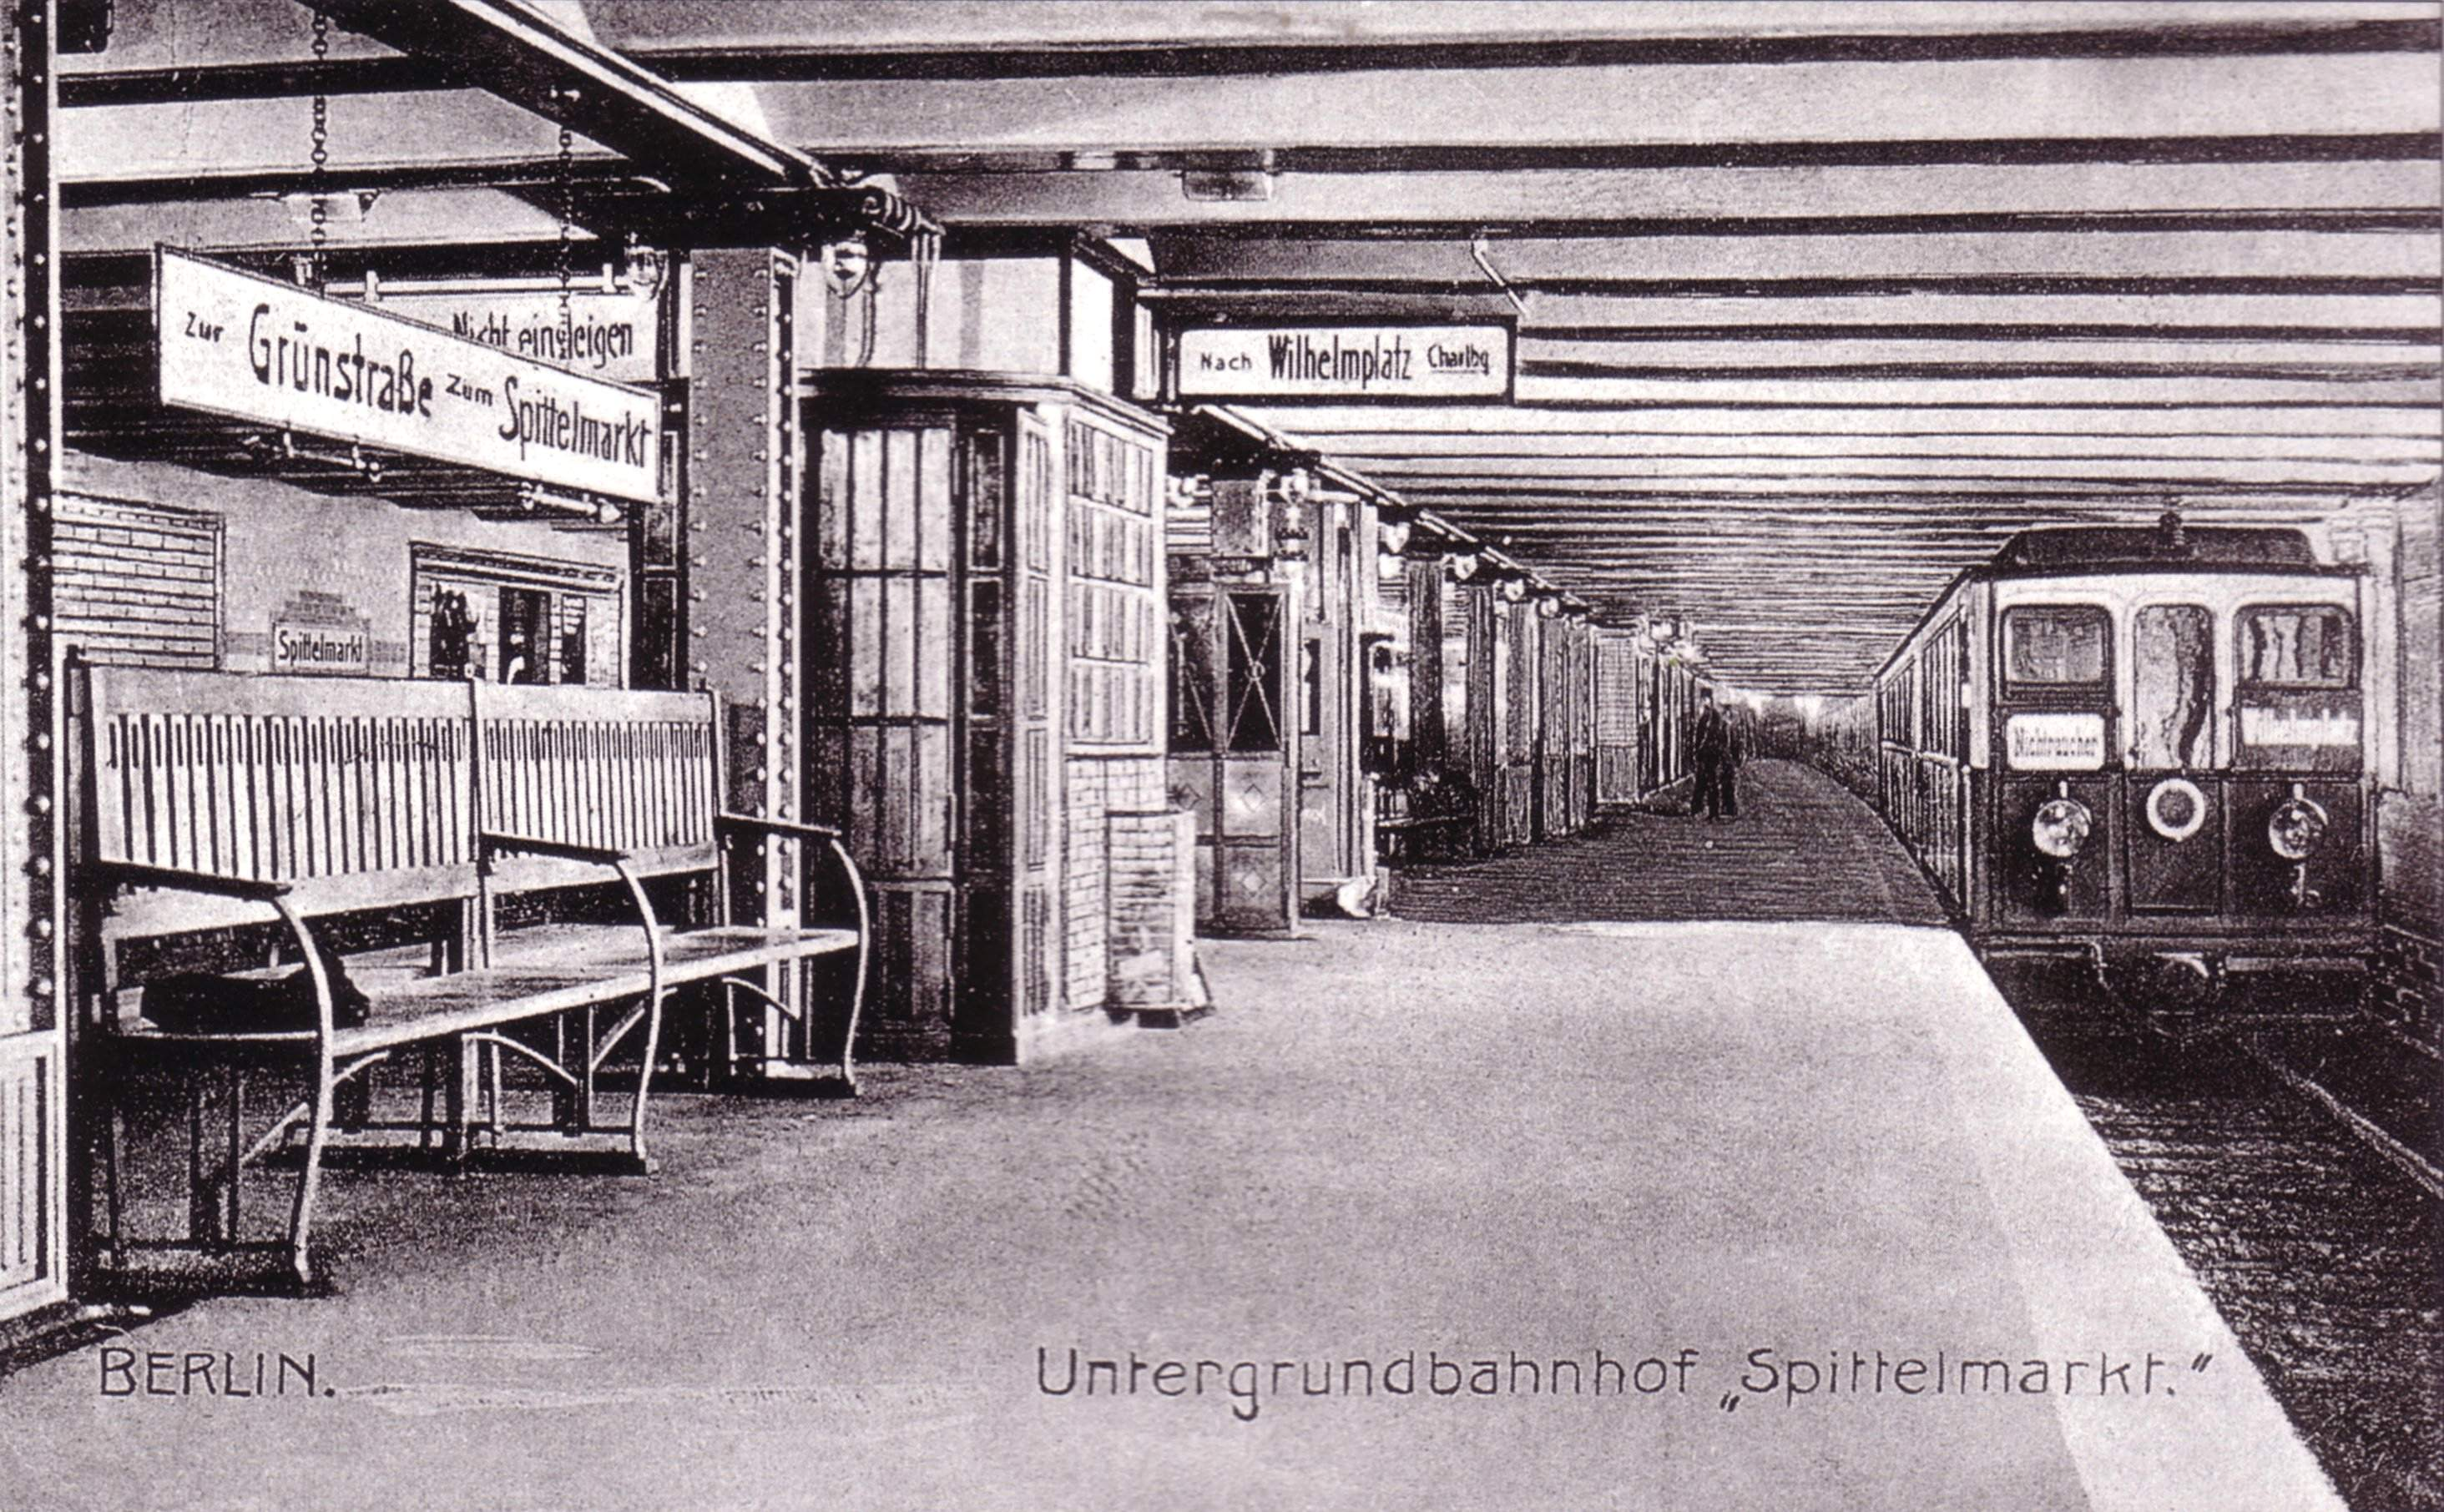 Newu-bahn_berlin_spittelmarkt_1908-